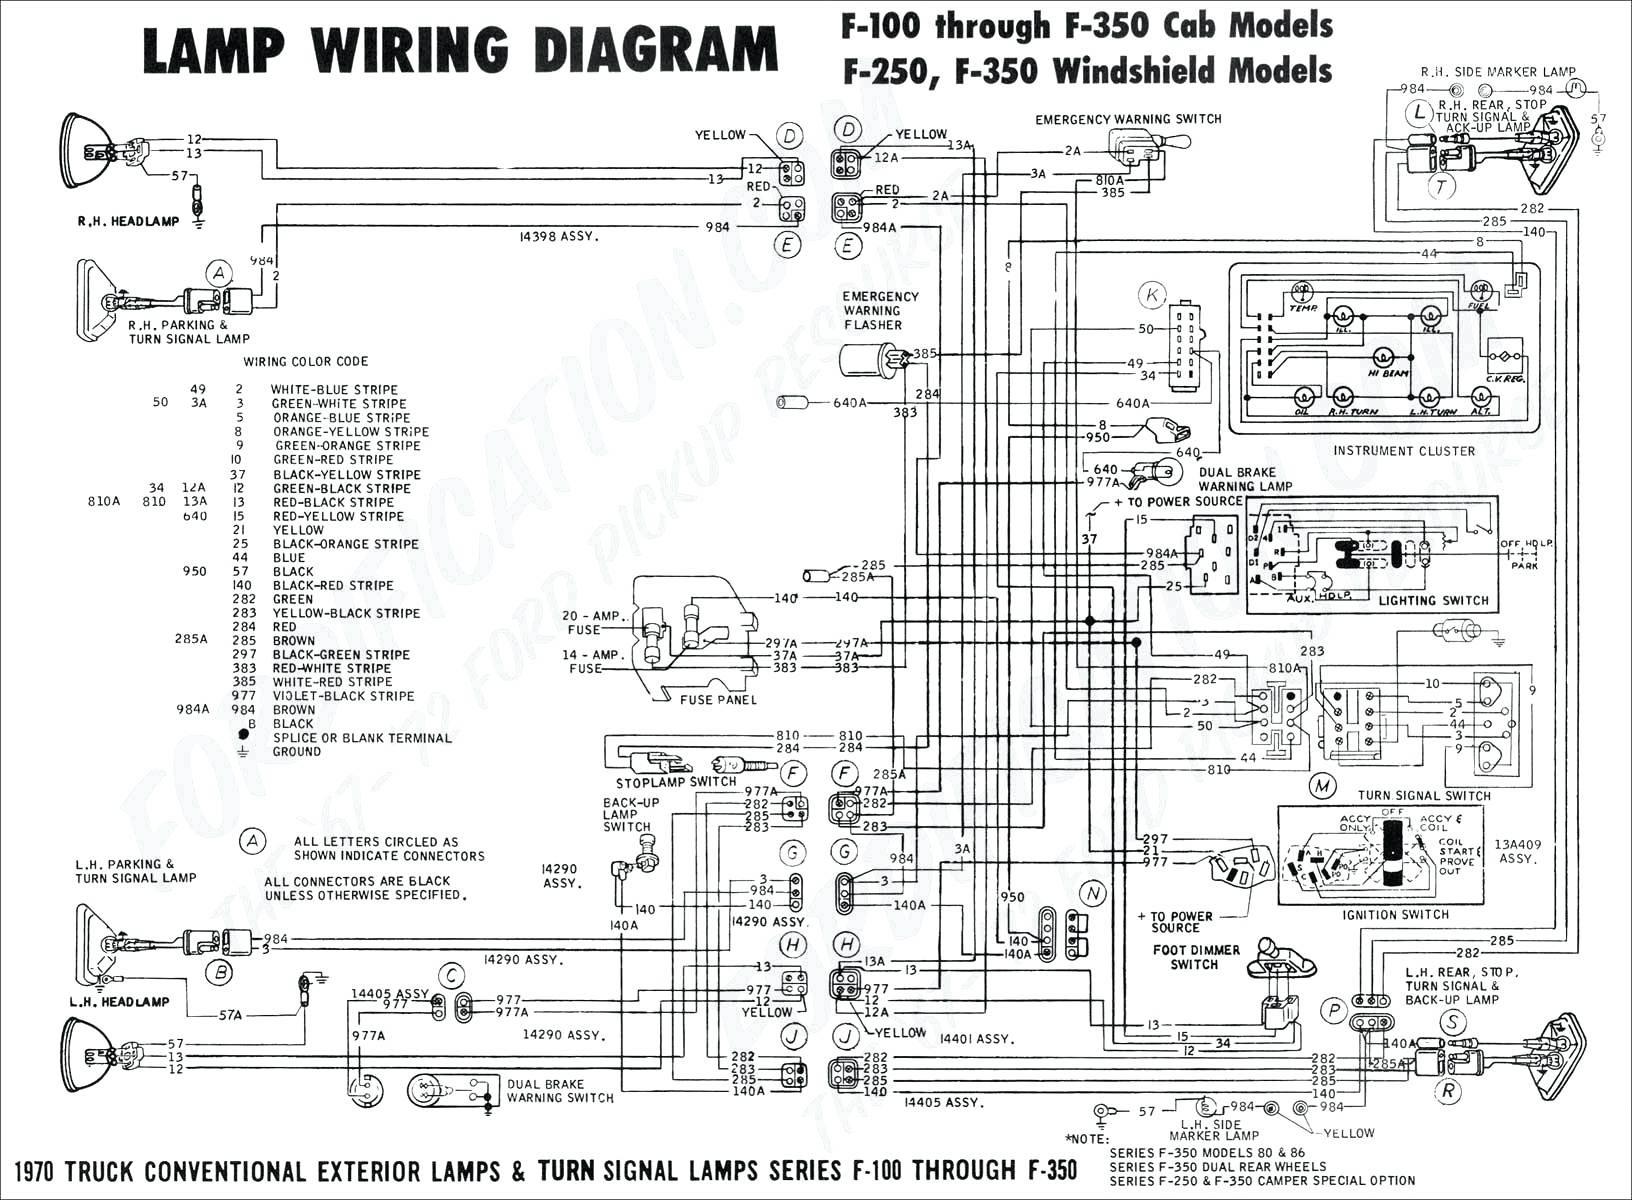 Horse Trailer Wiring Diagrams - Wiring Diagram Update on